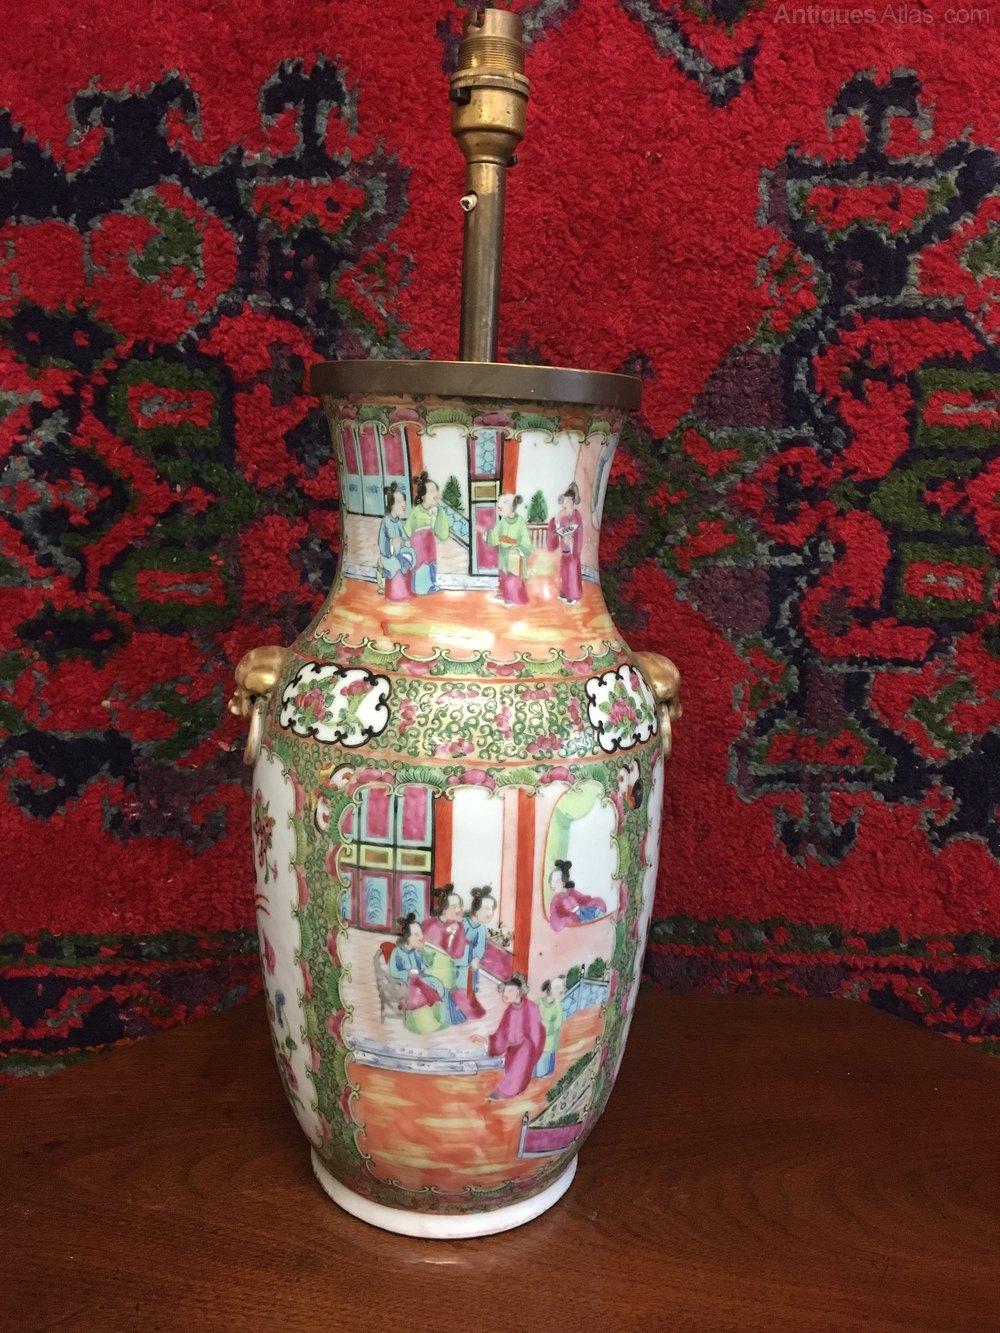 Antiques Atlas Antique Chinese Vase Lamp